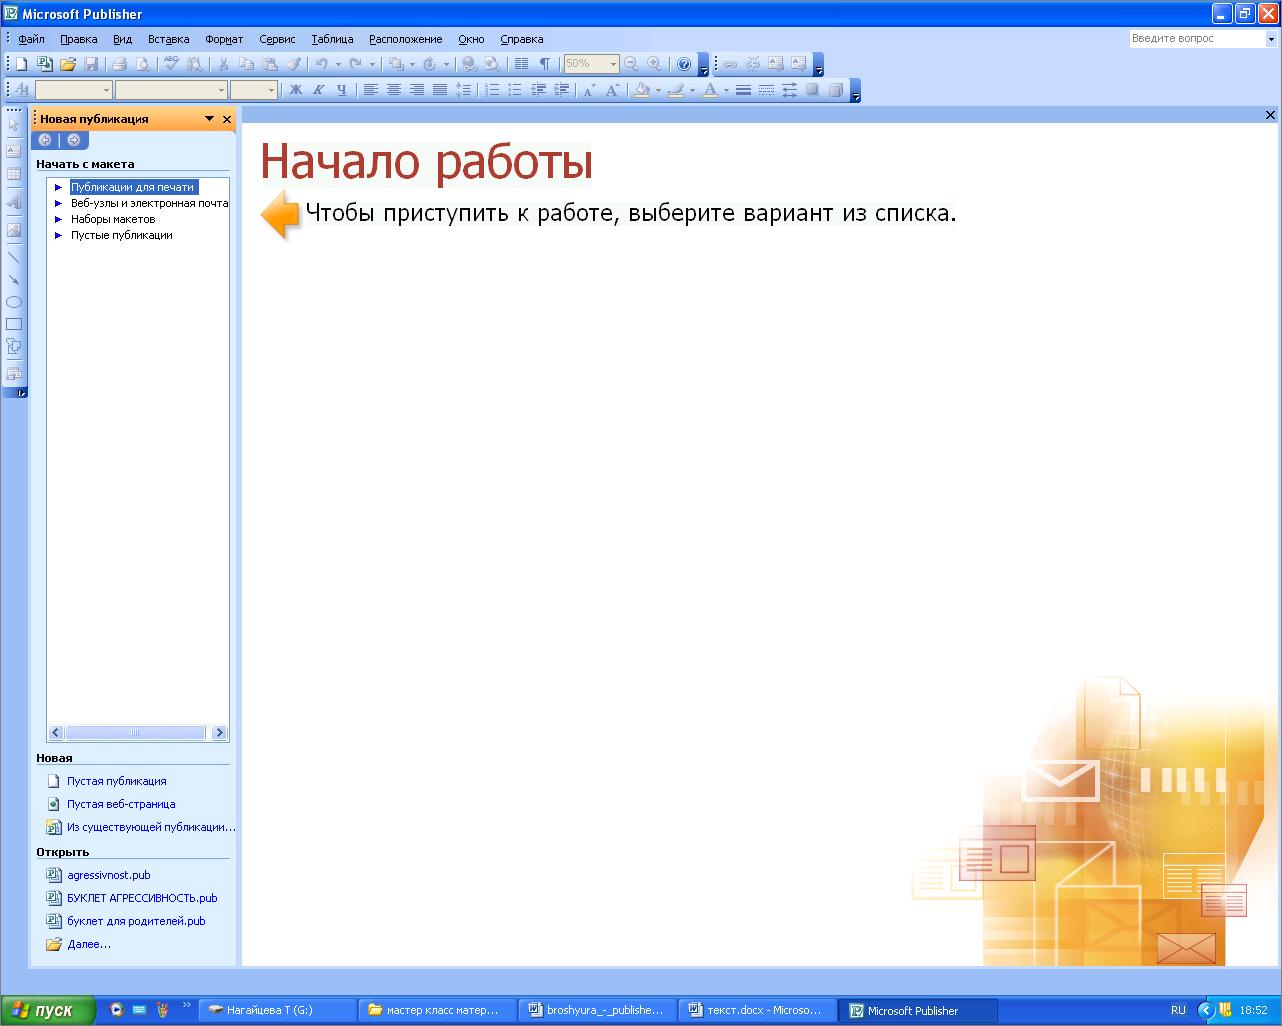 C:\Users\Андрей\Desktop\2.png